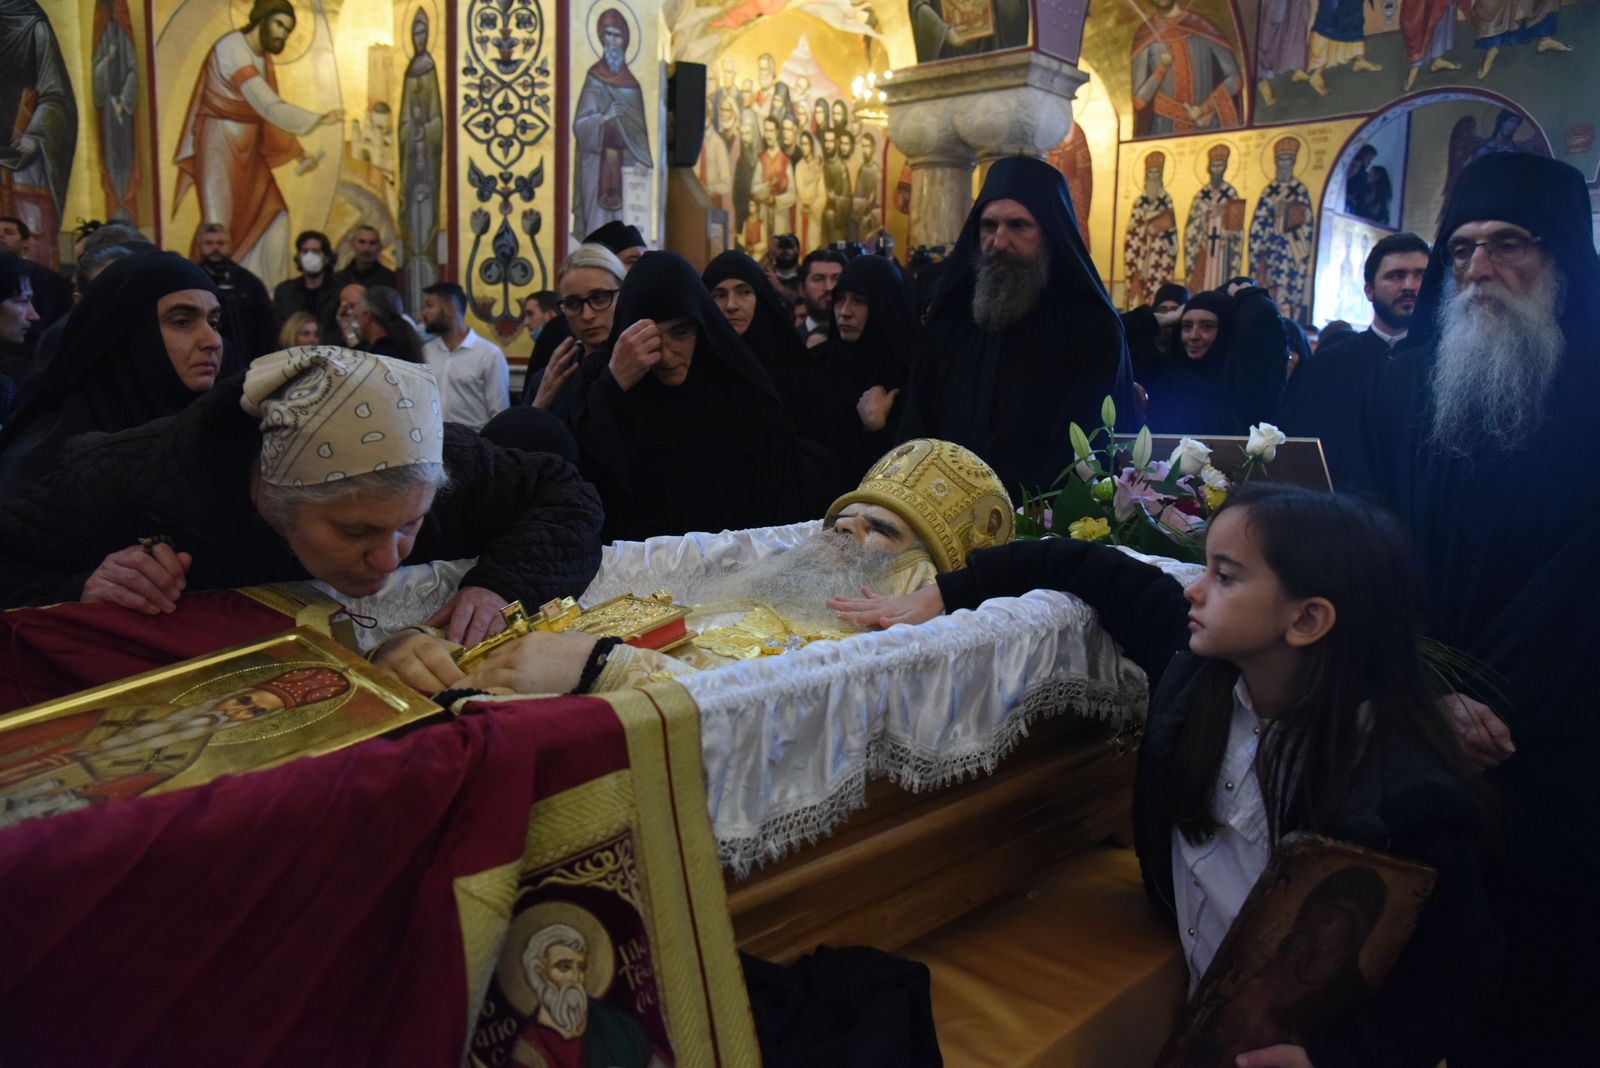 Funeral of Serbian Orthodox Church Metropolitan bishop of Montenegro, Metropolitan Amfilohije, Podgorica - 01 Nov 2020